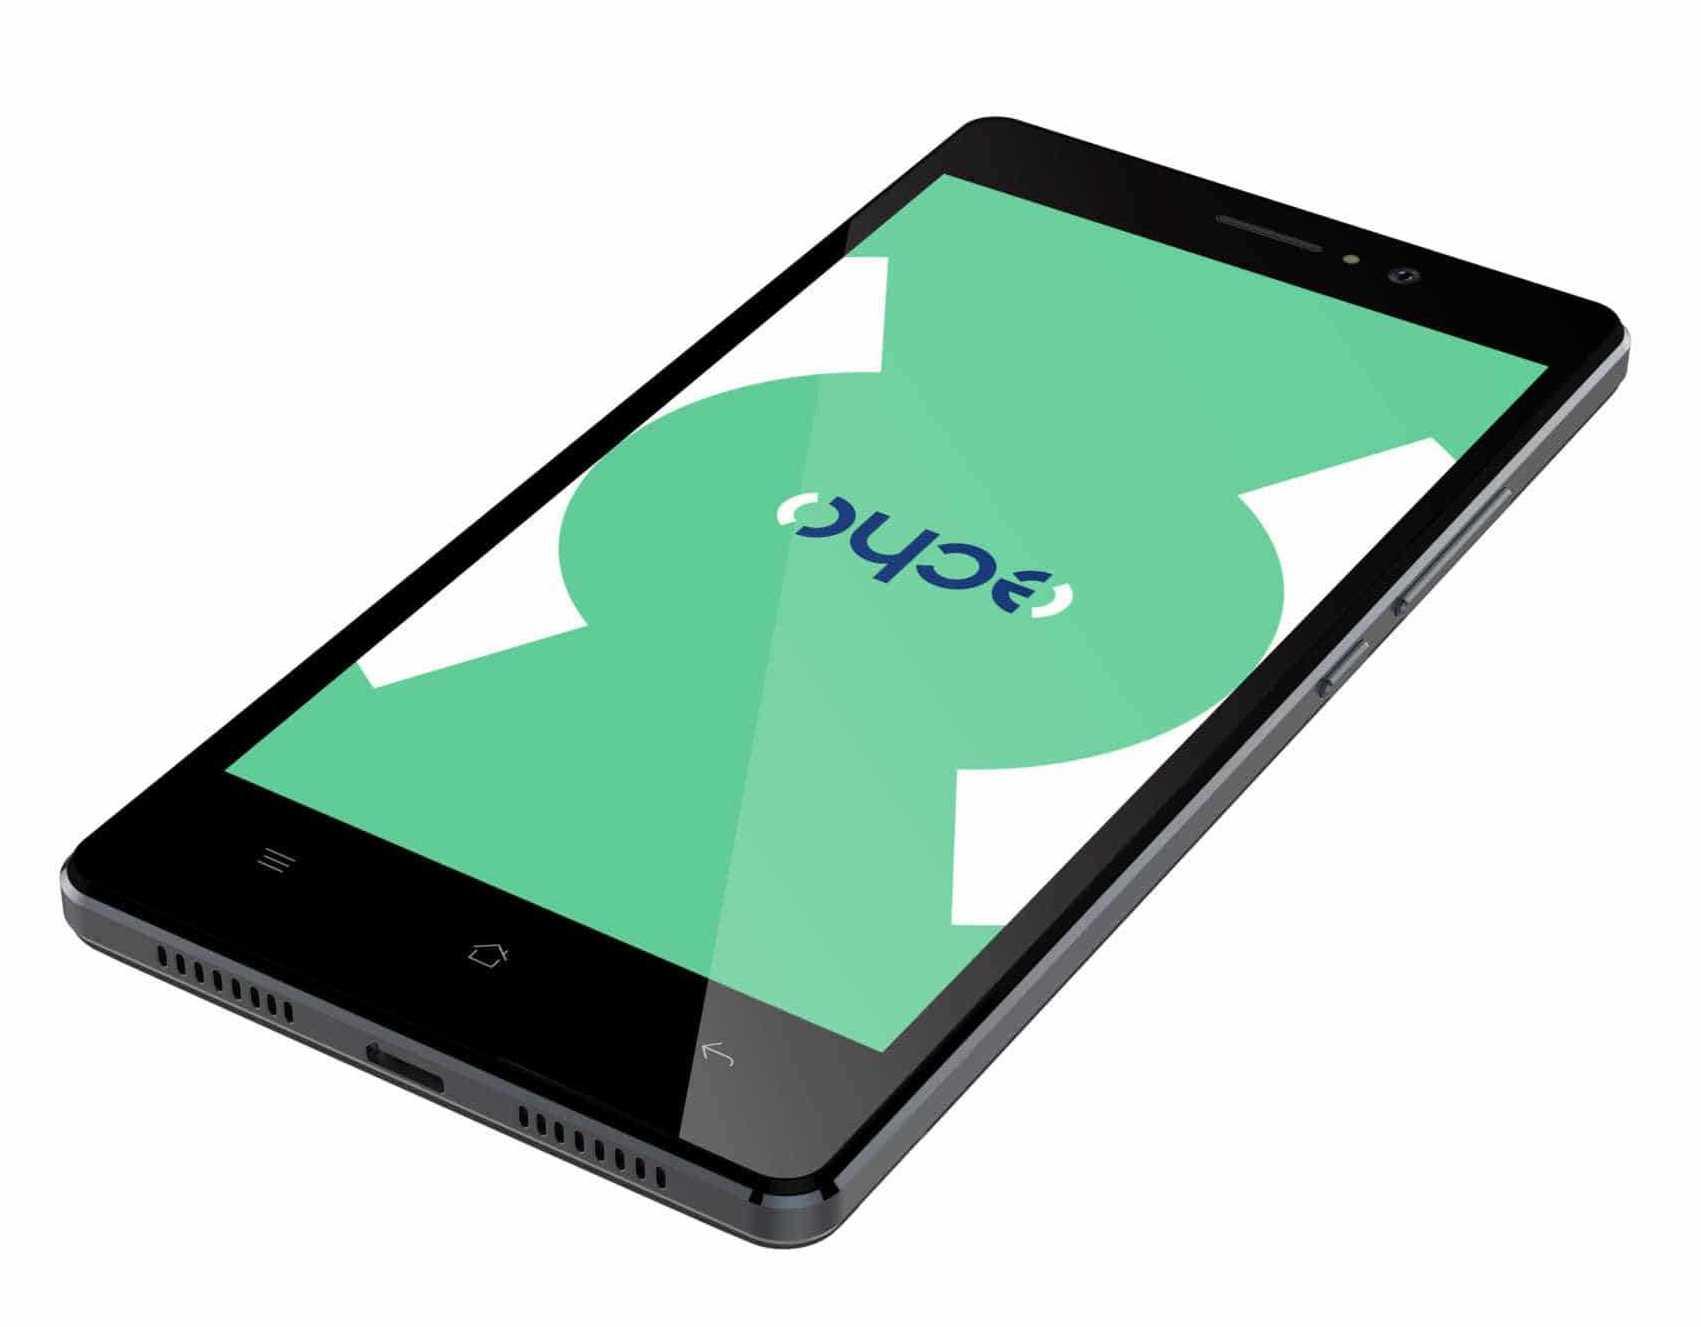 ECHO-NOTE-black-Echo-wallpaper-4-e1476712509705 #Concours : un smartphone ECHO Note à gagner !